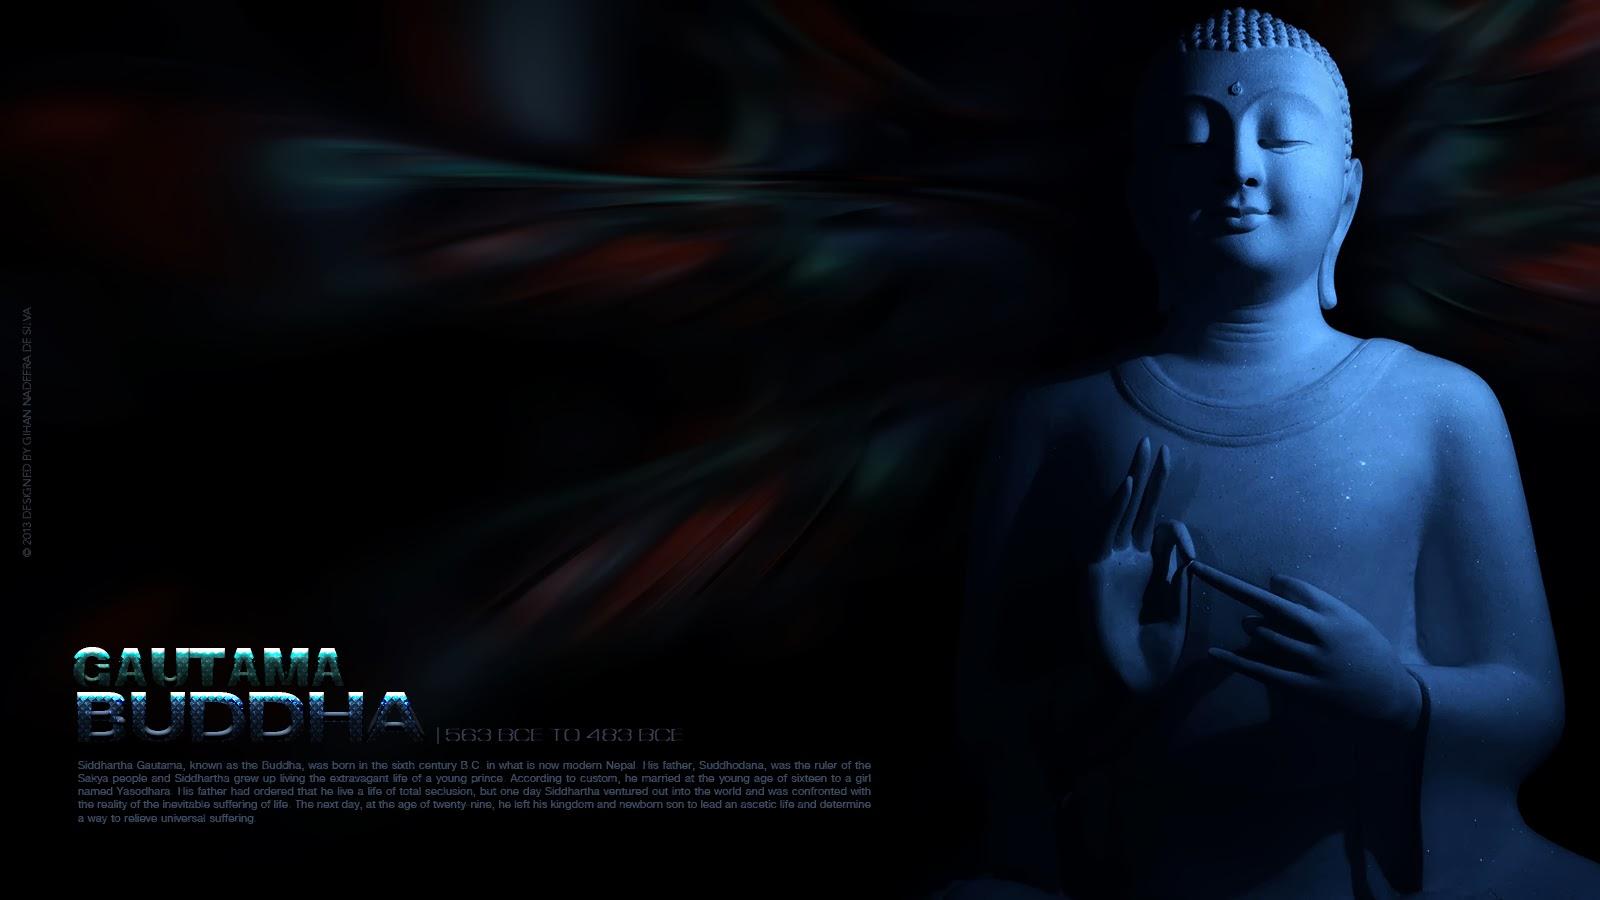 gautama buddha wallpaper with quotes - photo #9